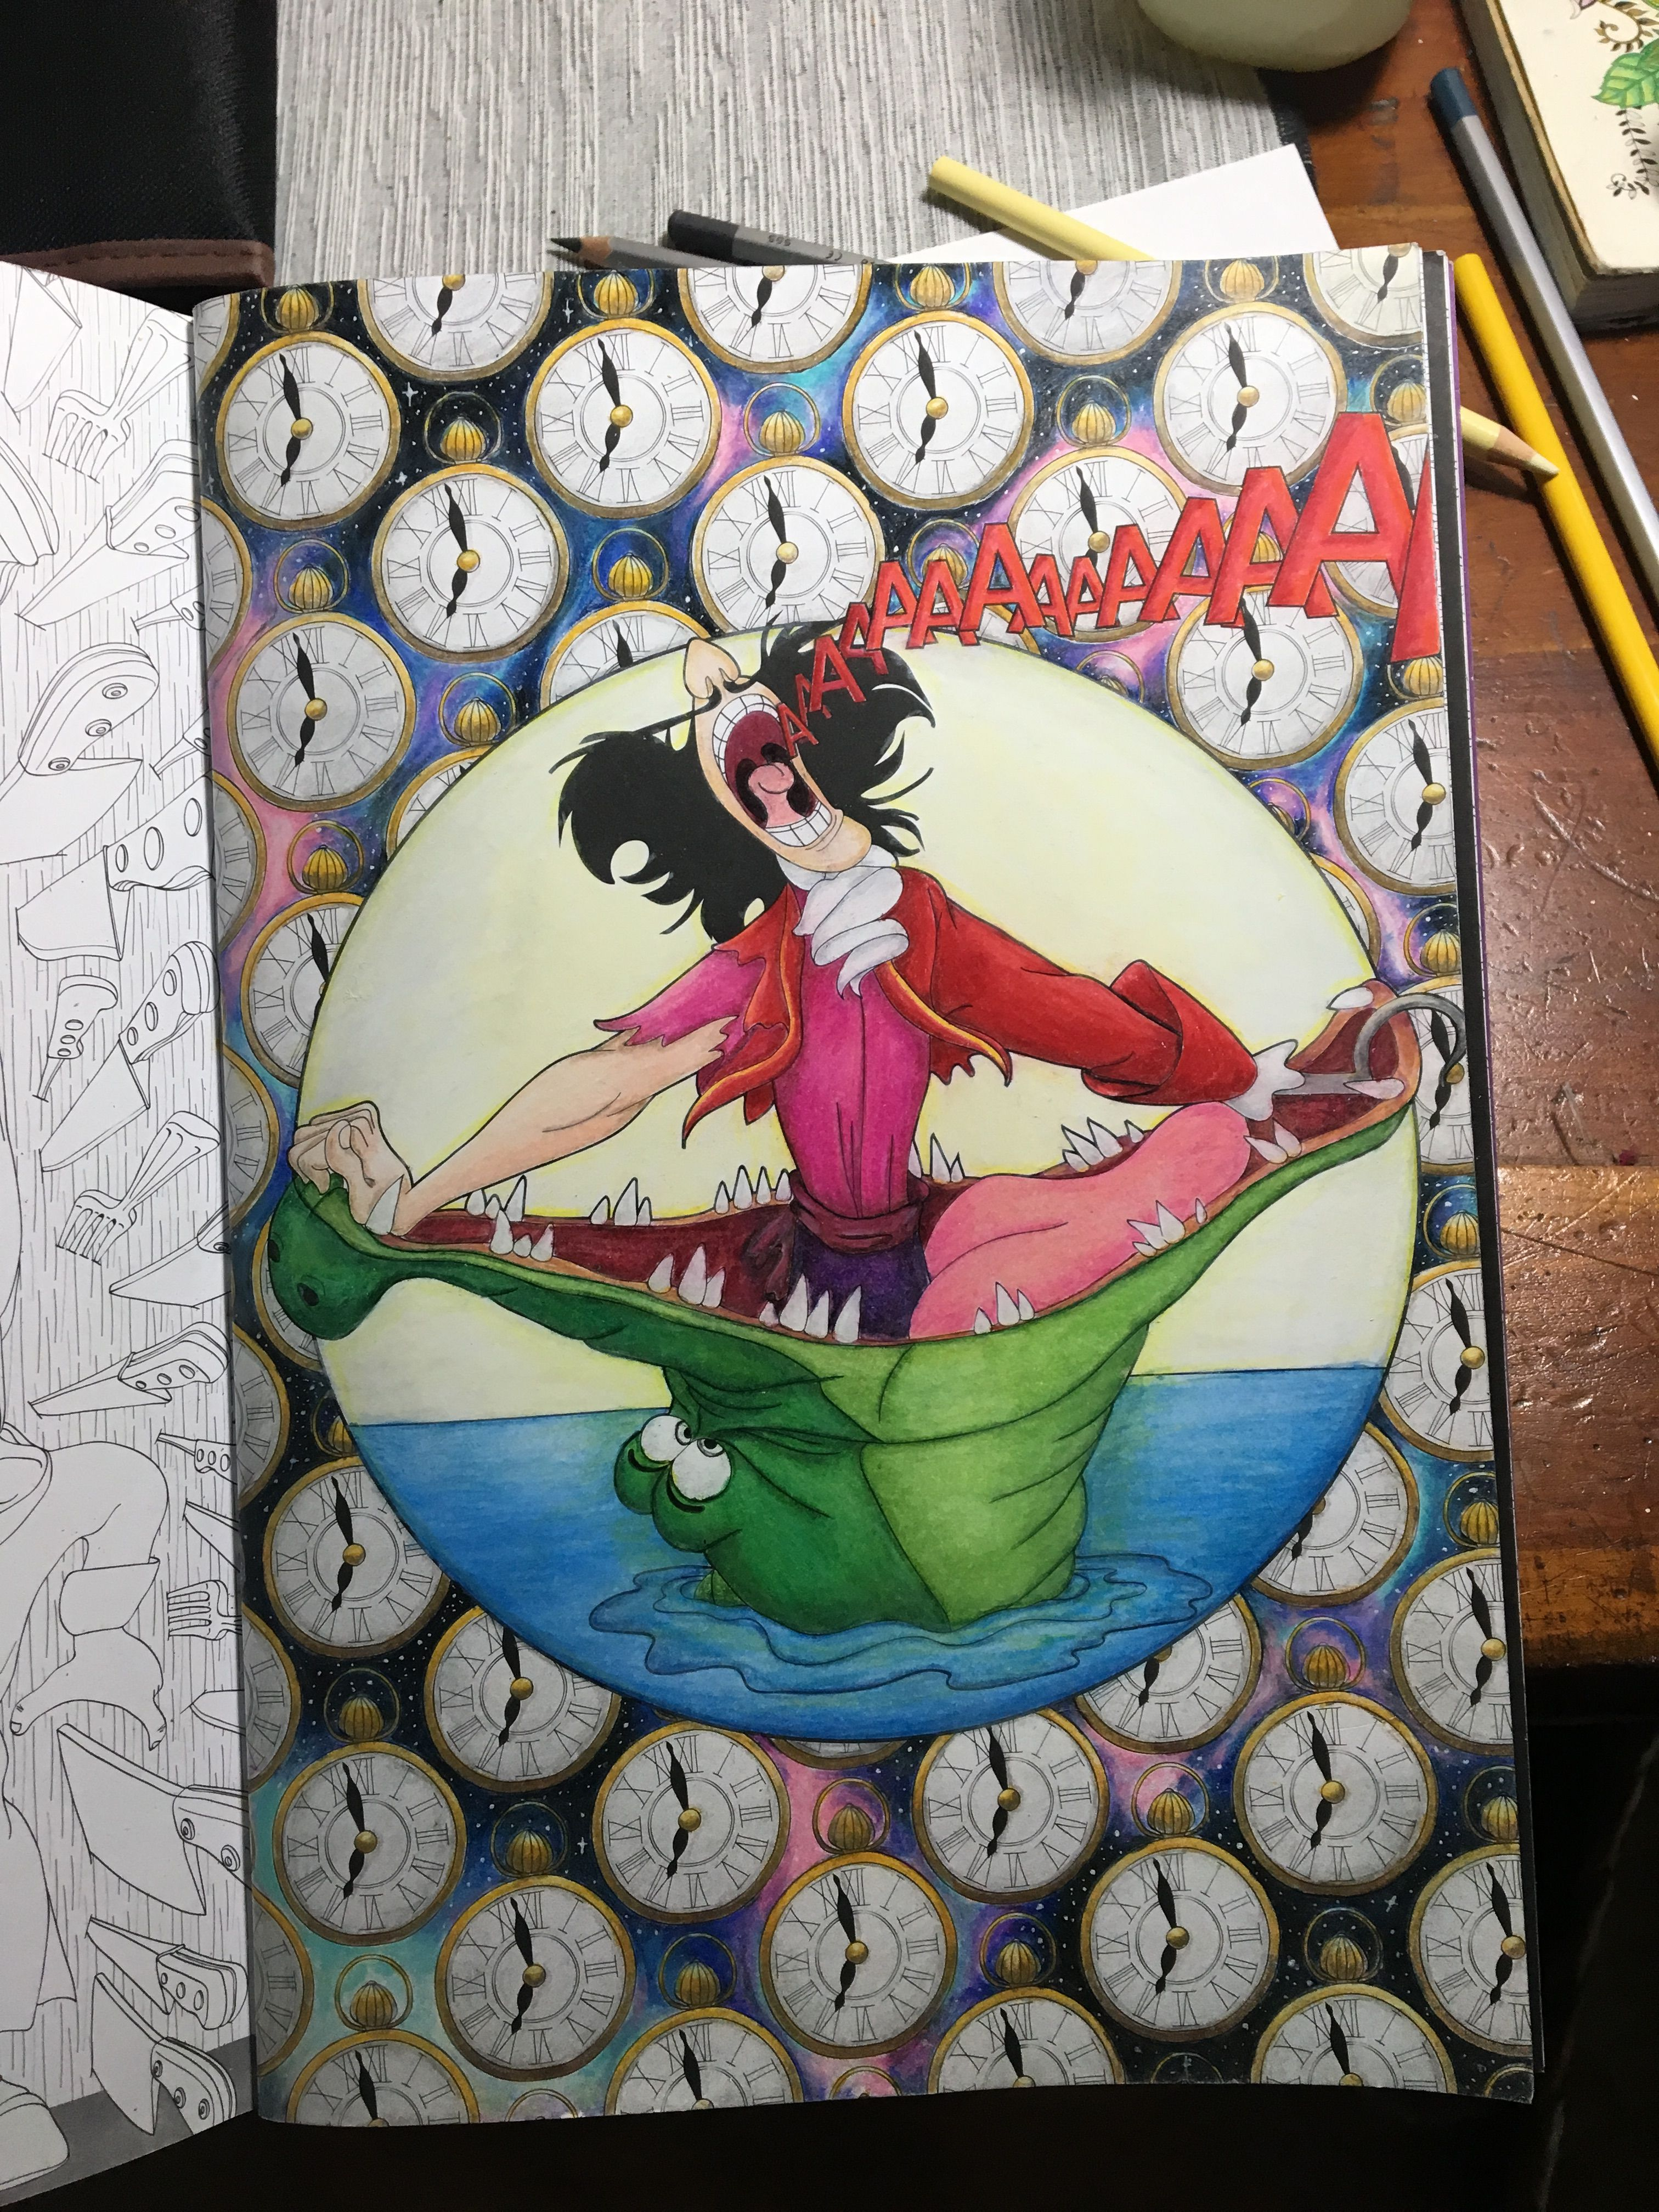 Art of coloring Disney villains - Captain Hook. By far my favorite